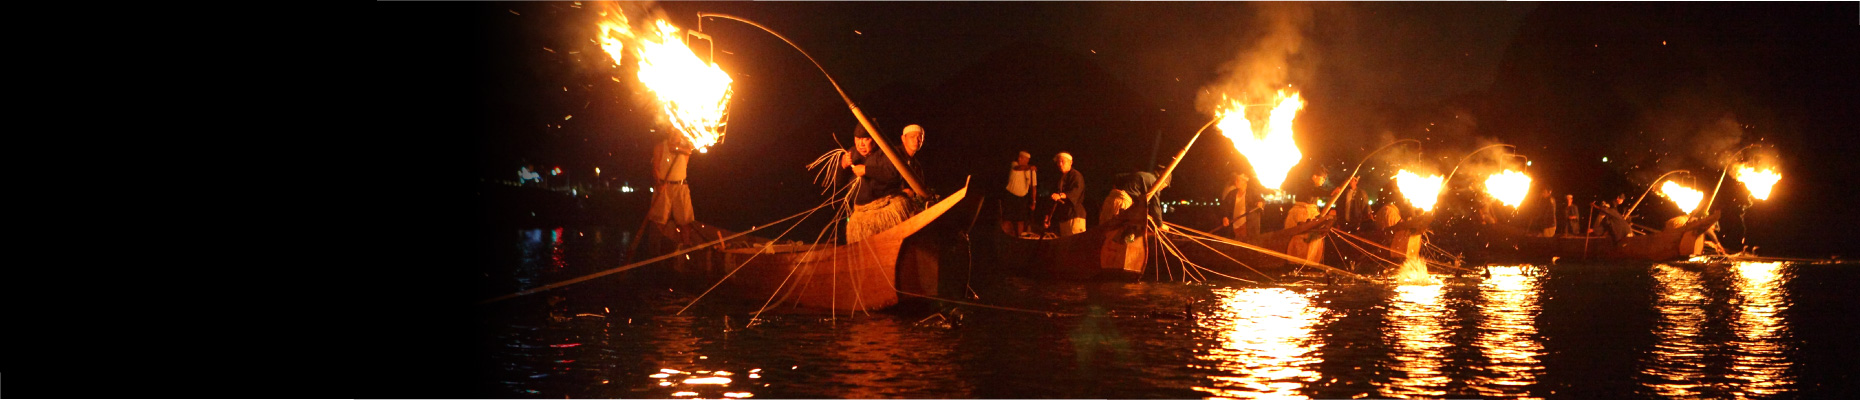 Ukai (Cormorant Fishing) on the Nagara River